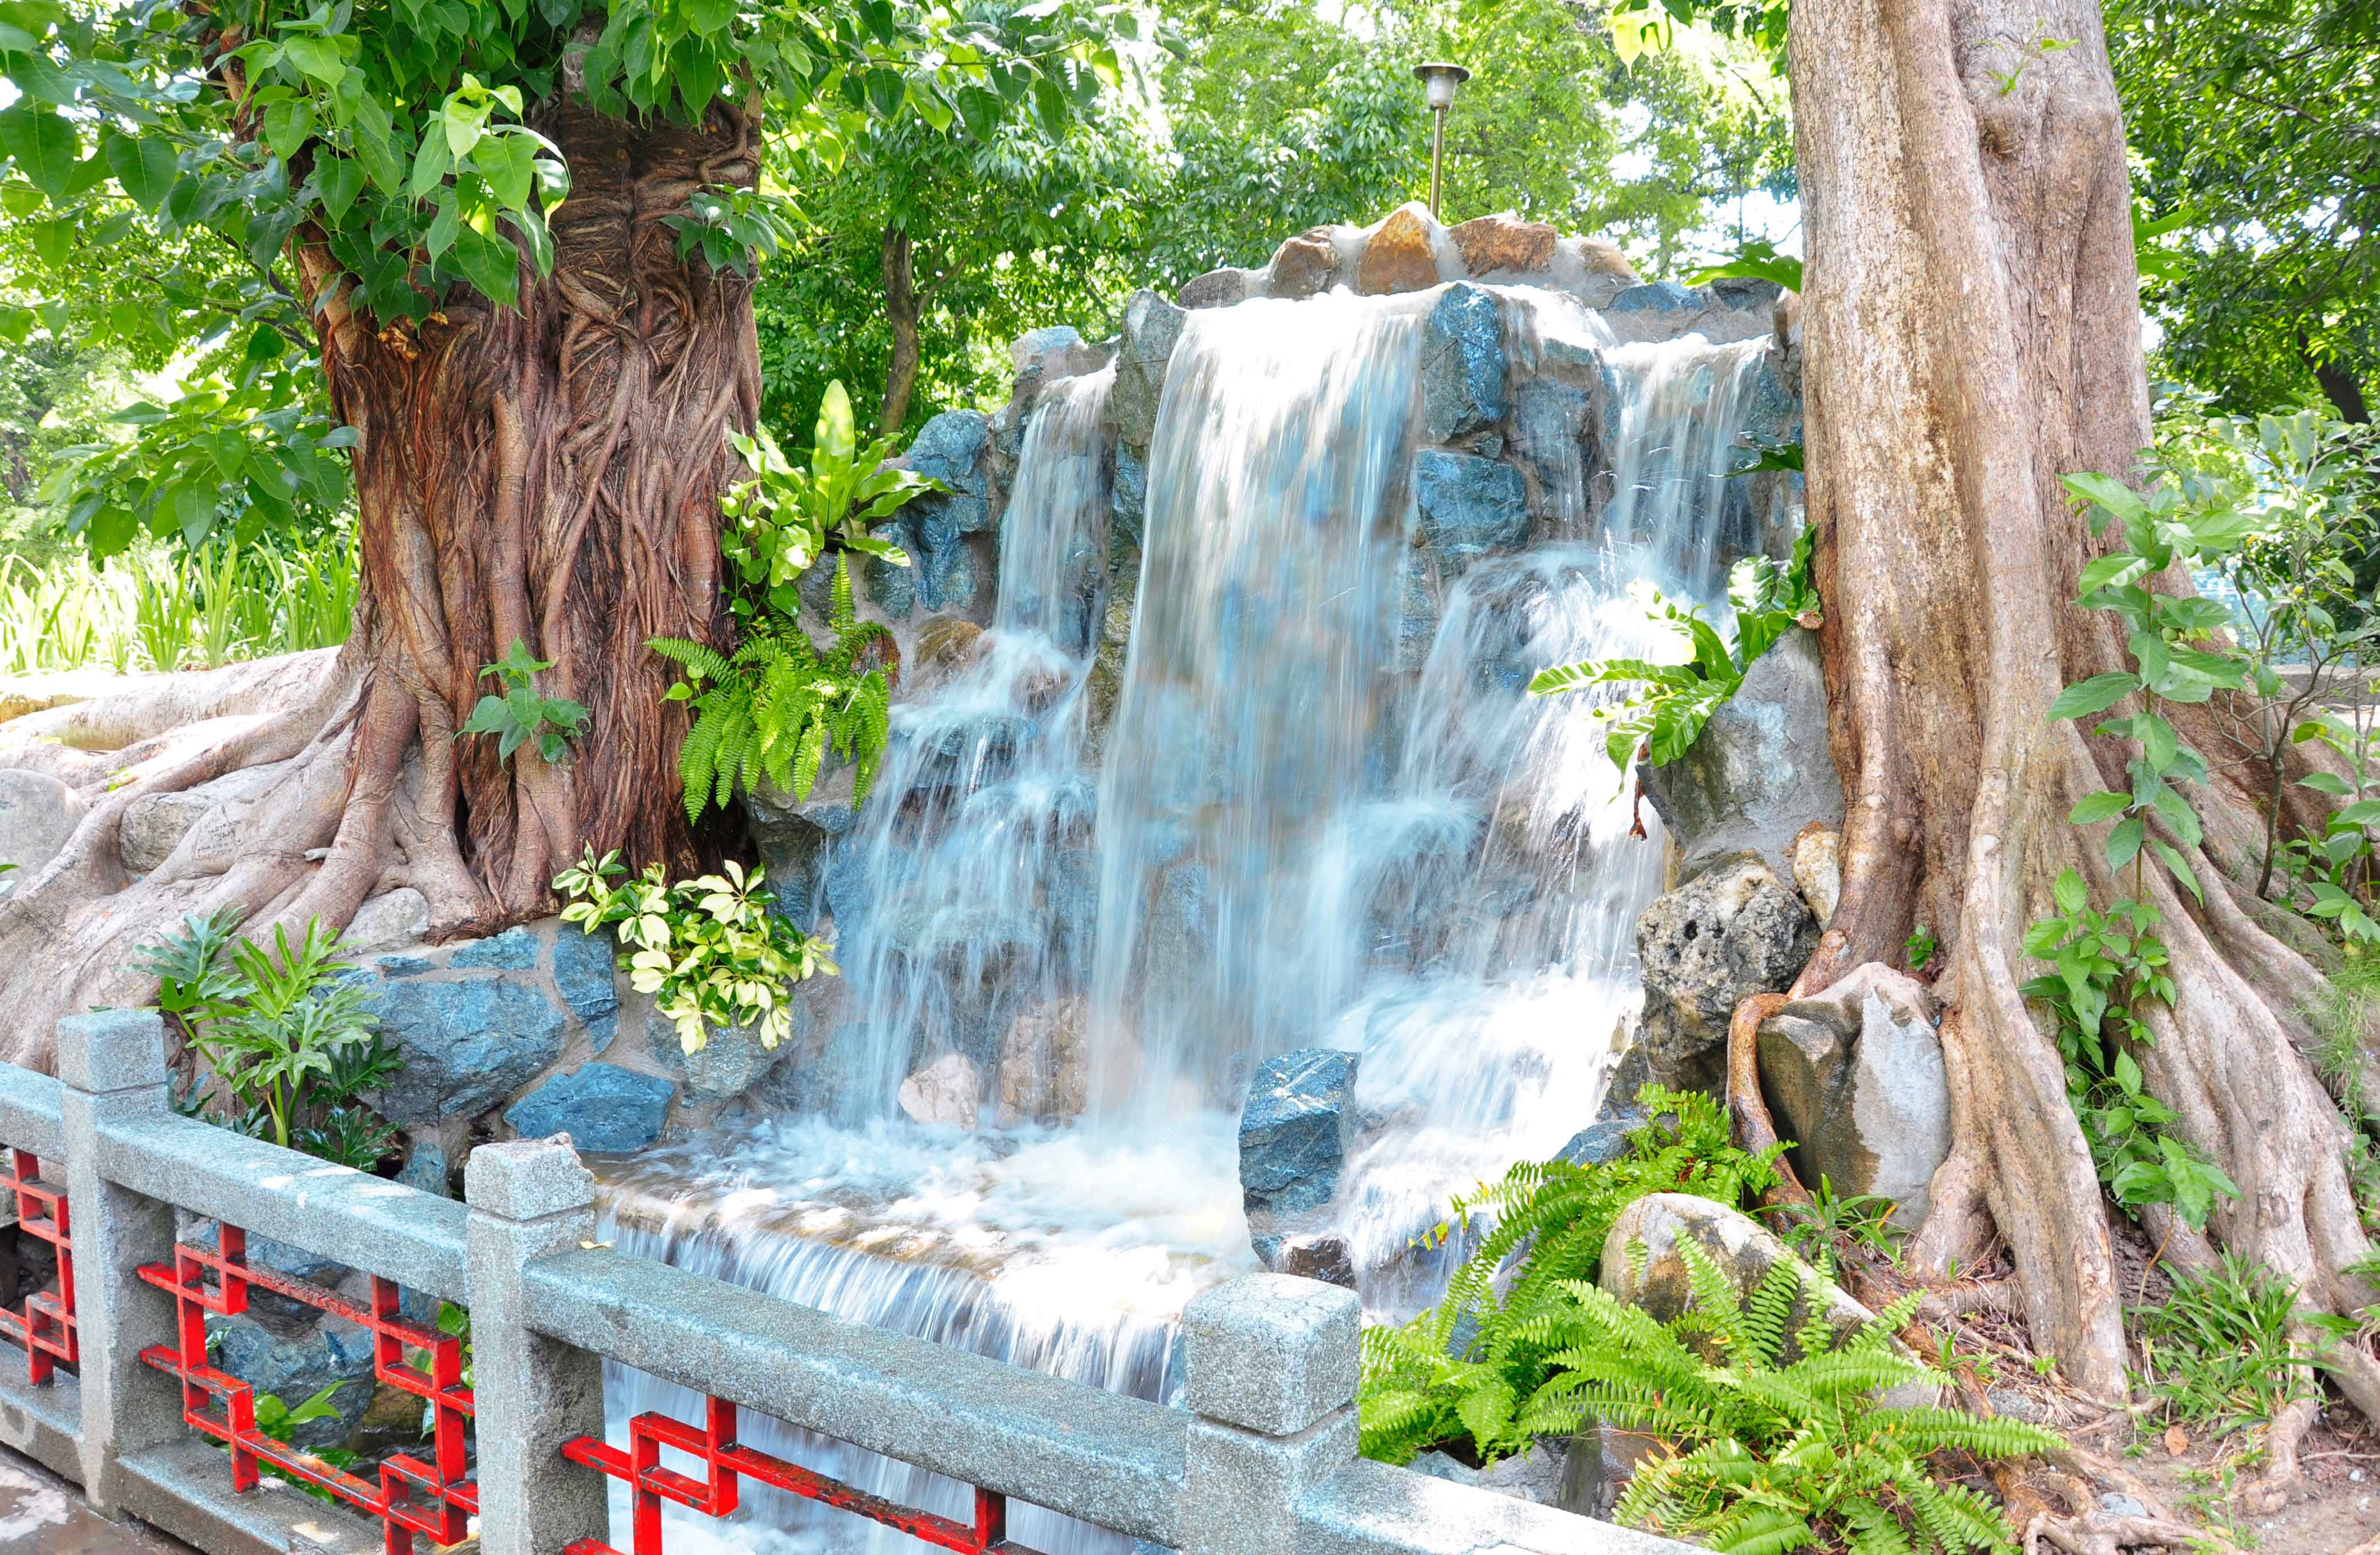 chinese garden waterfalls in luneta park manila philippine